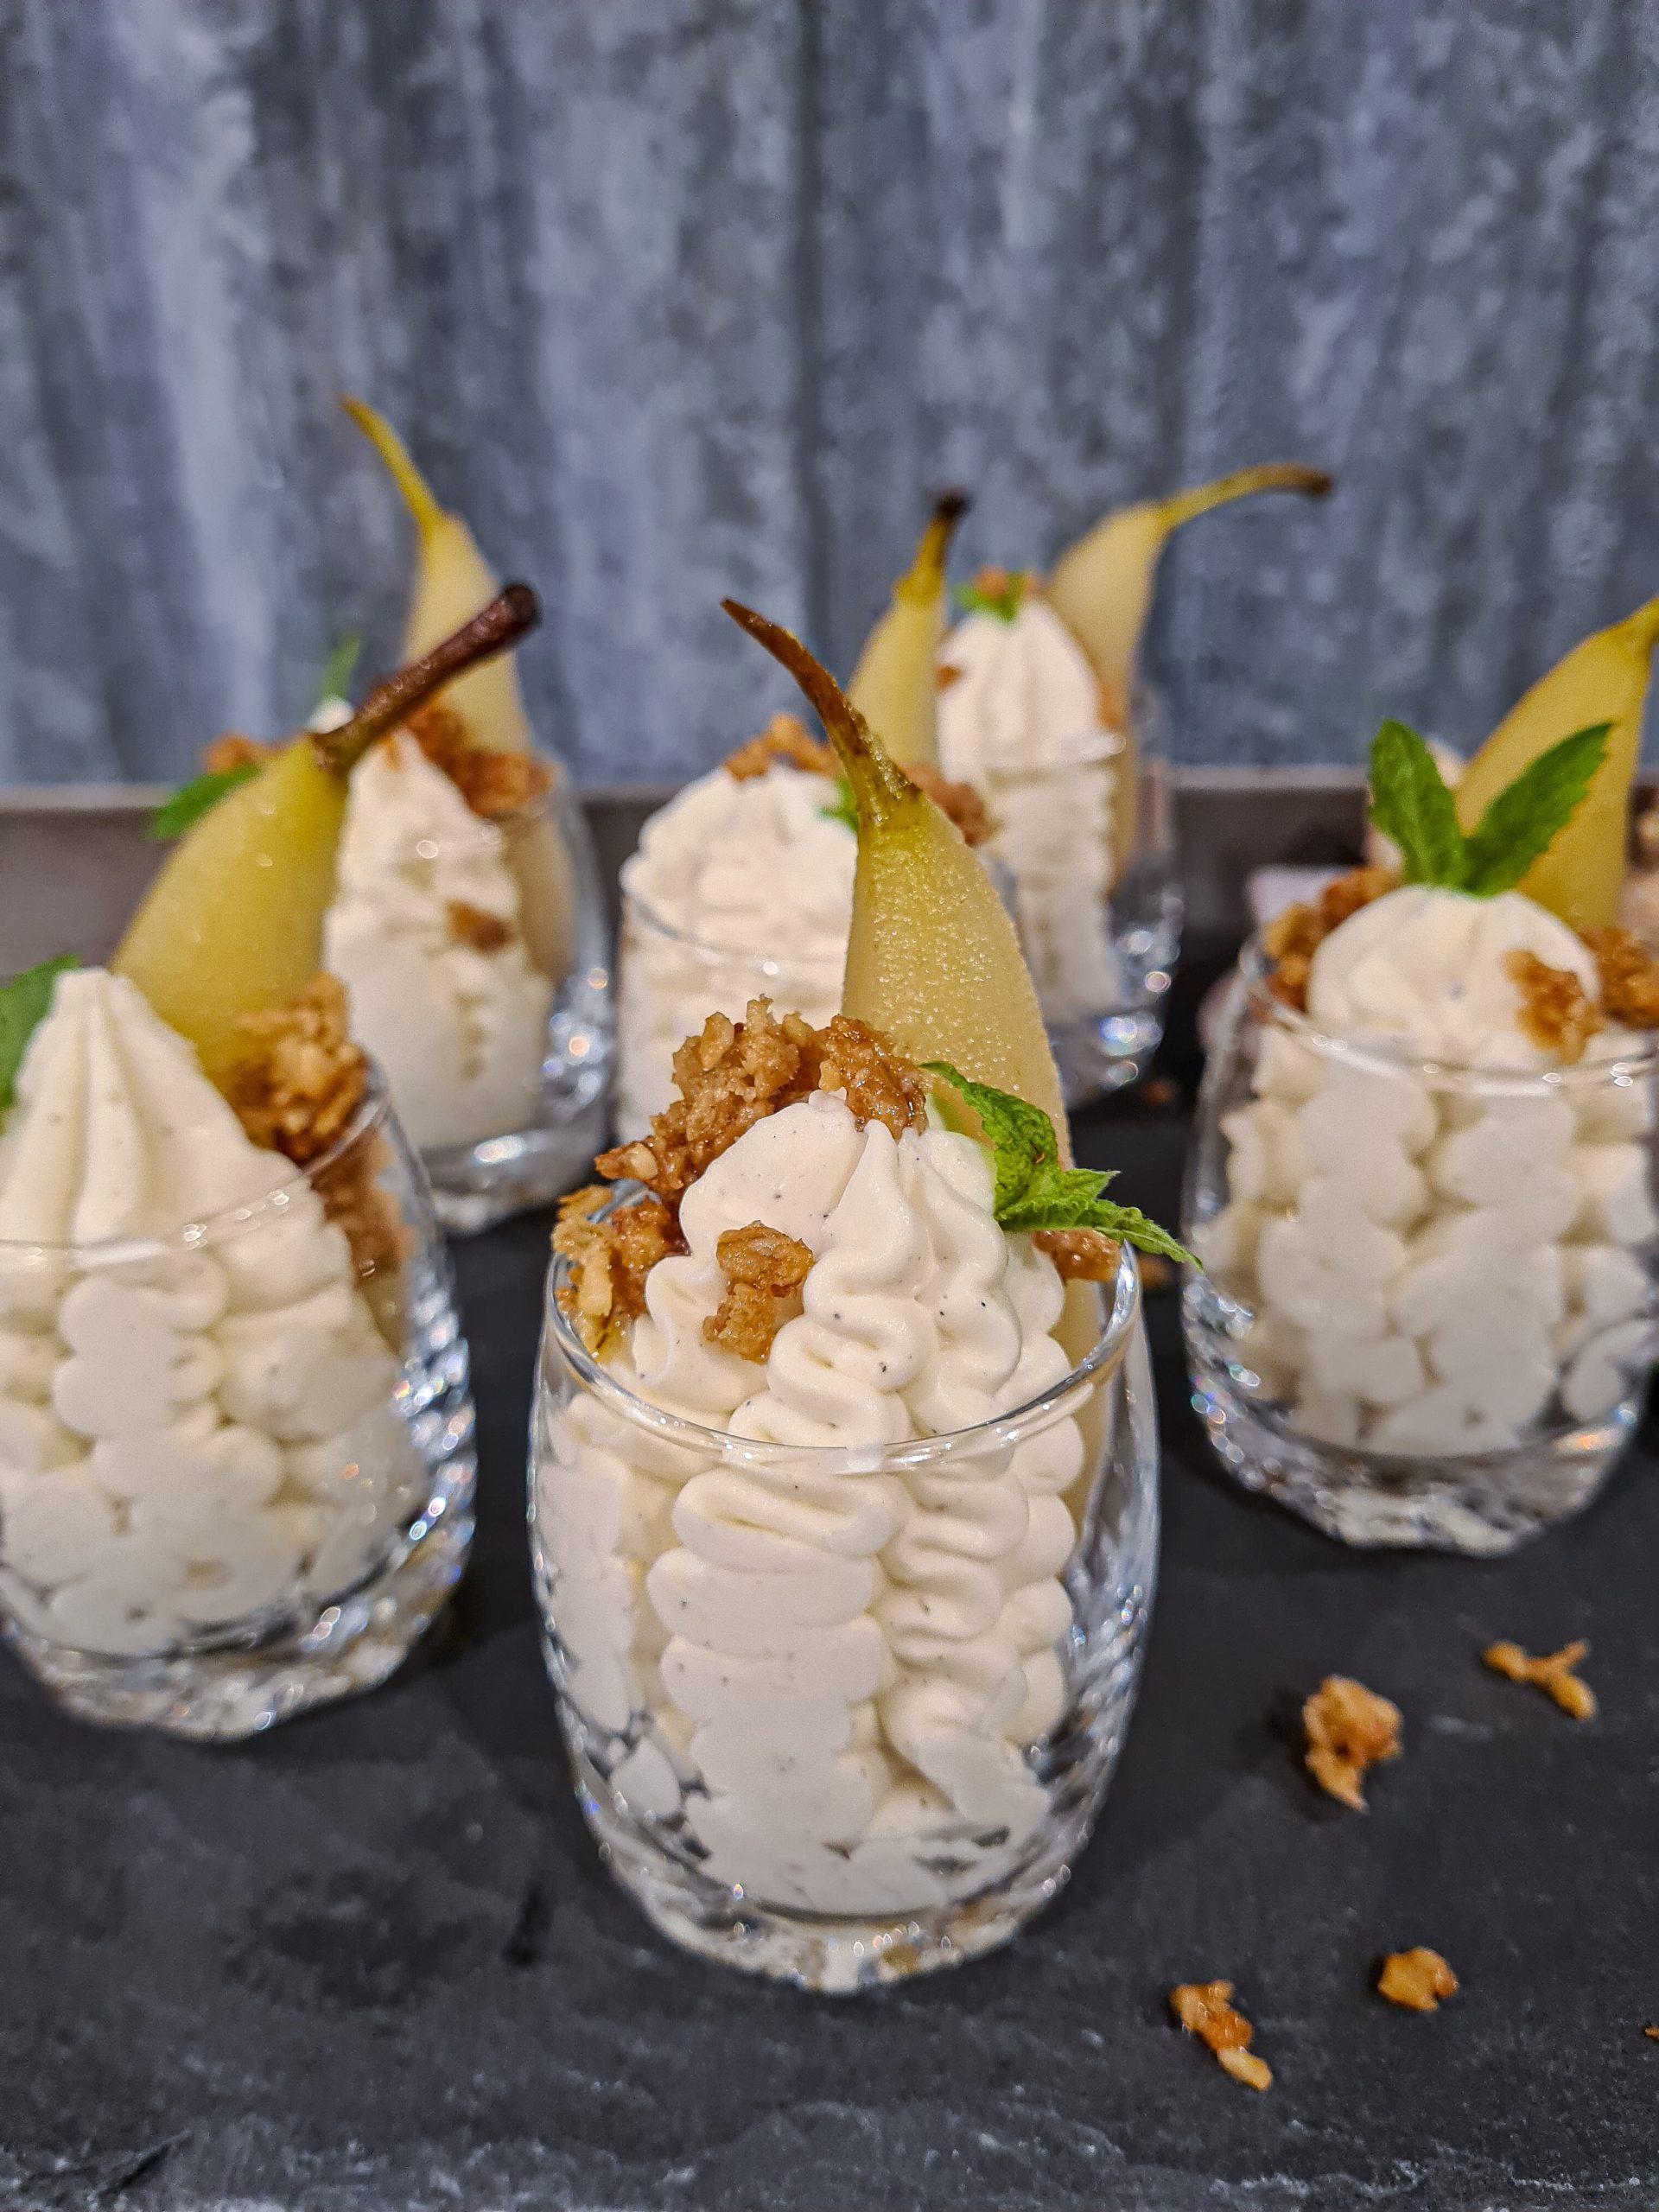 Vispad vaniljpannacotta med ingefärskokta päron